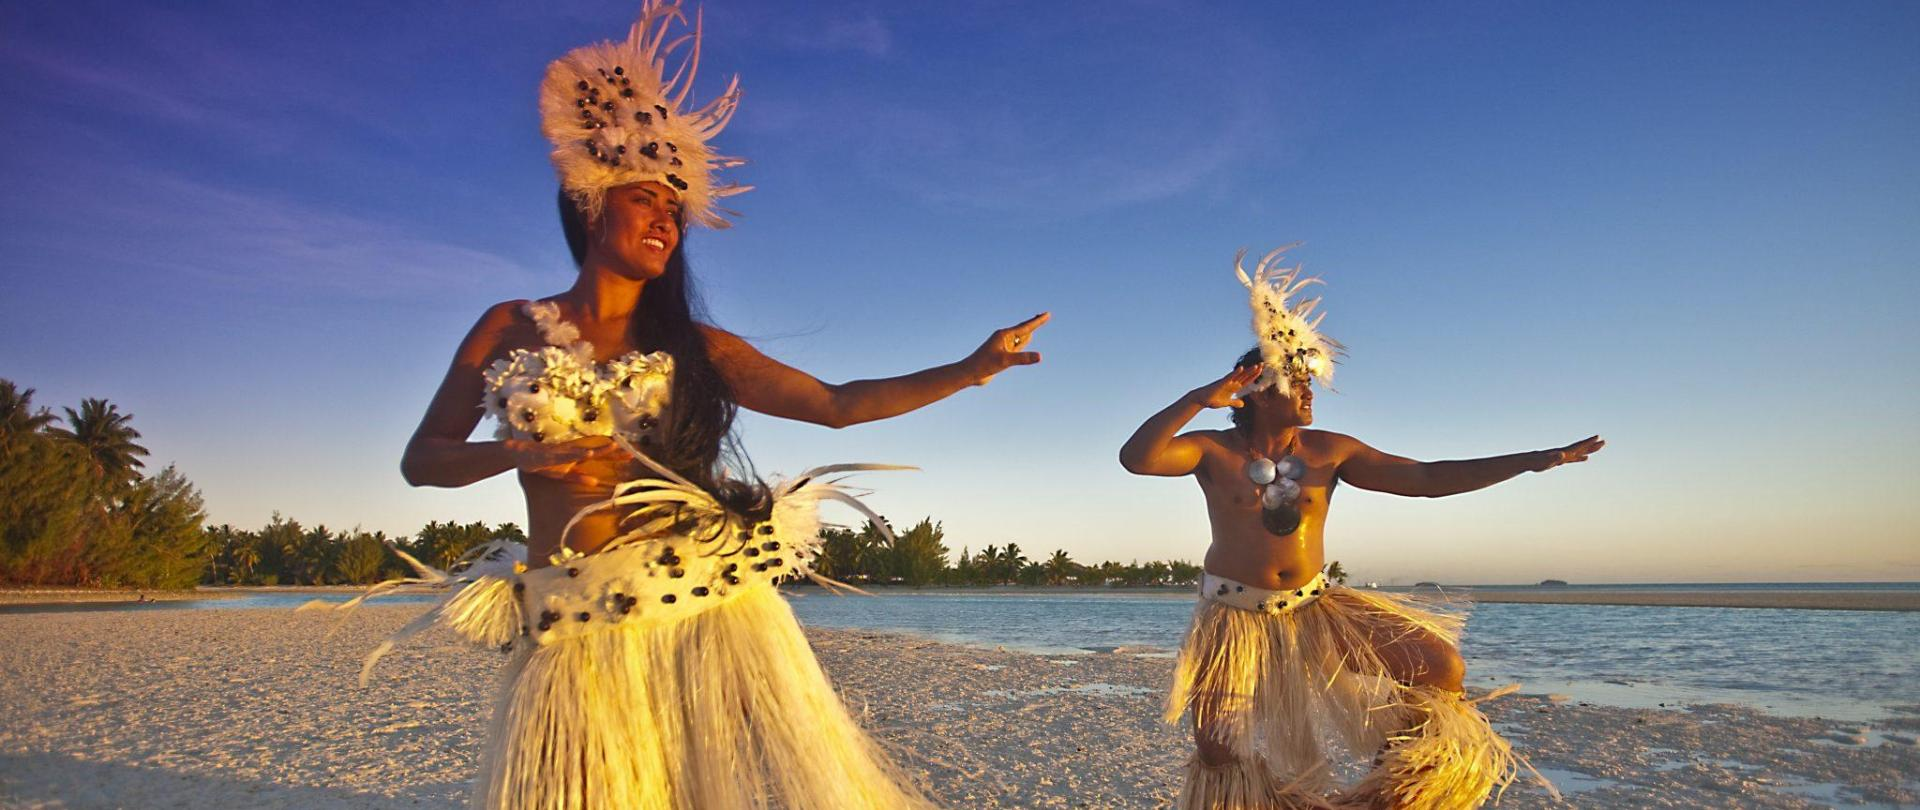 Aitutaki-CITC_1011_0038.jpg